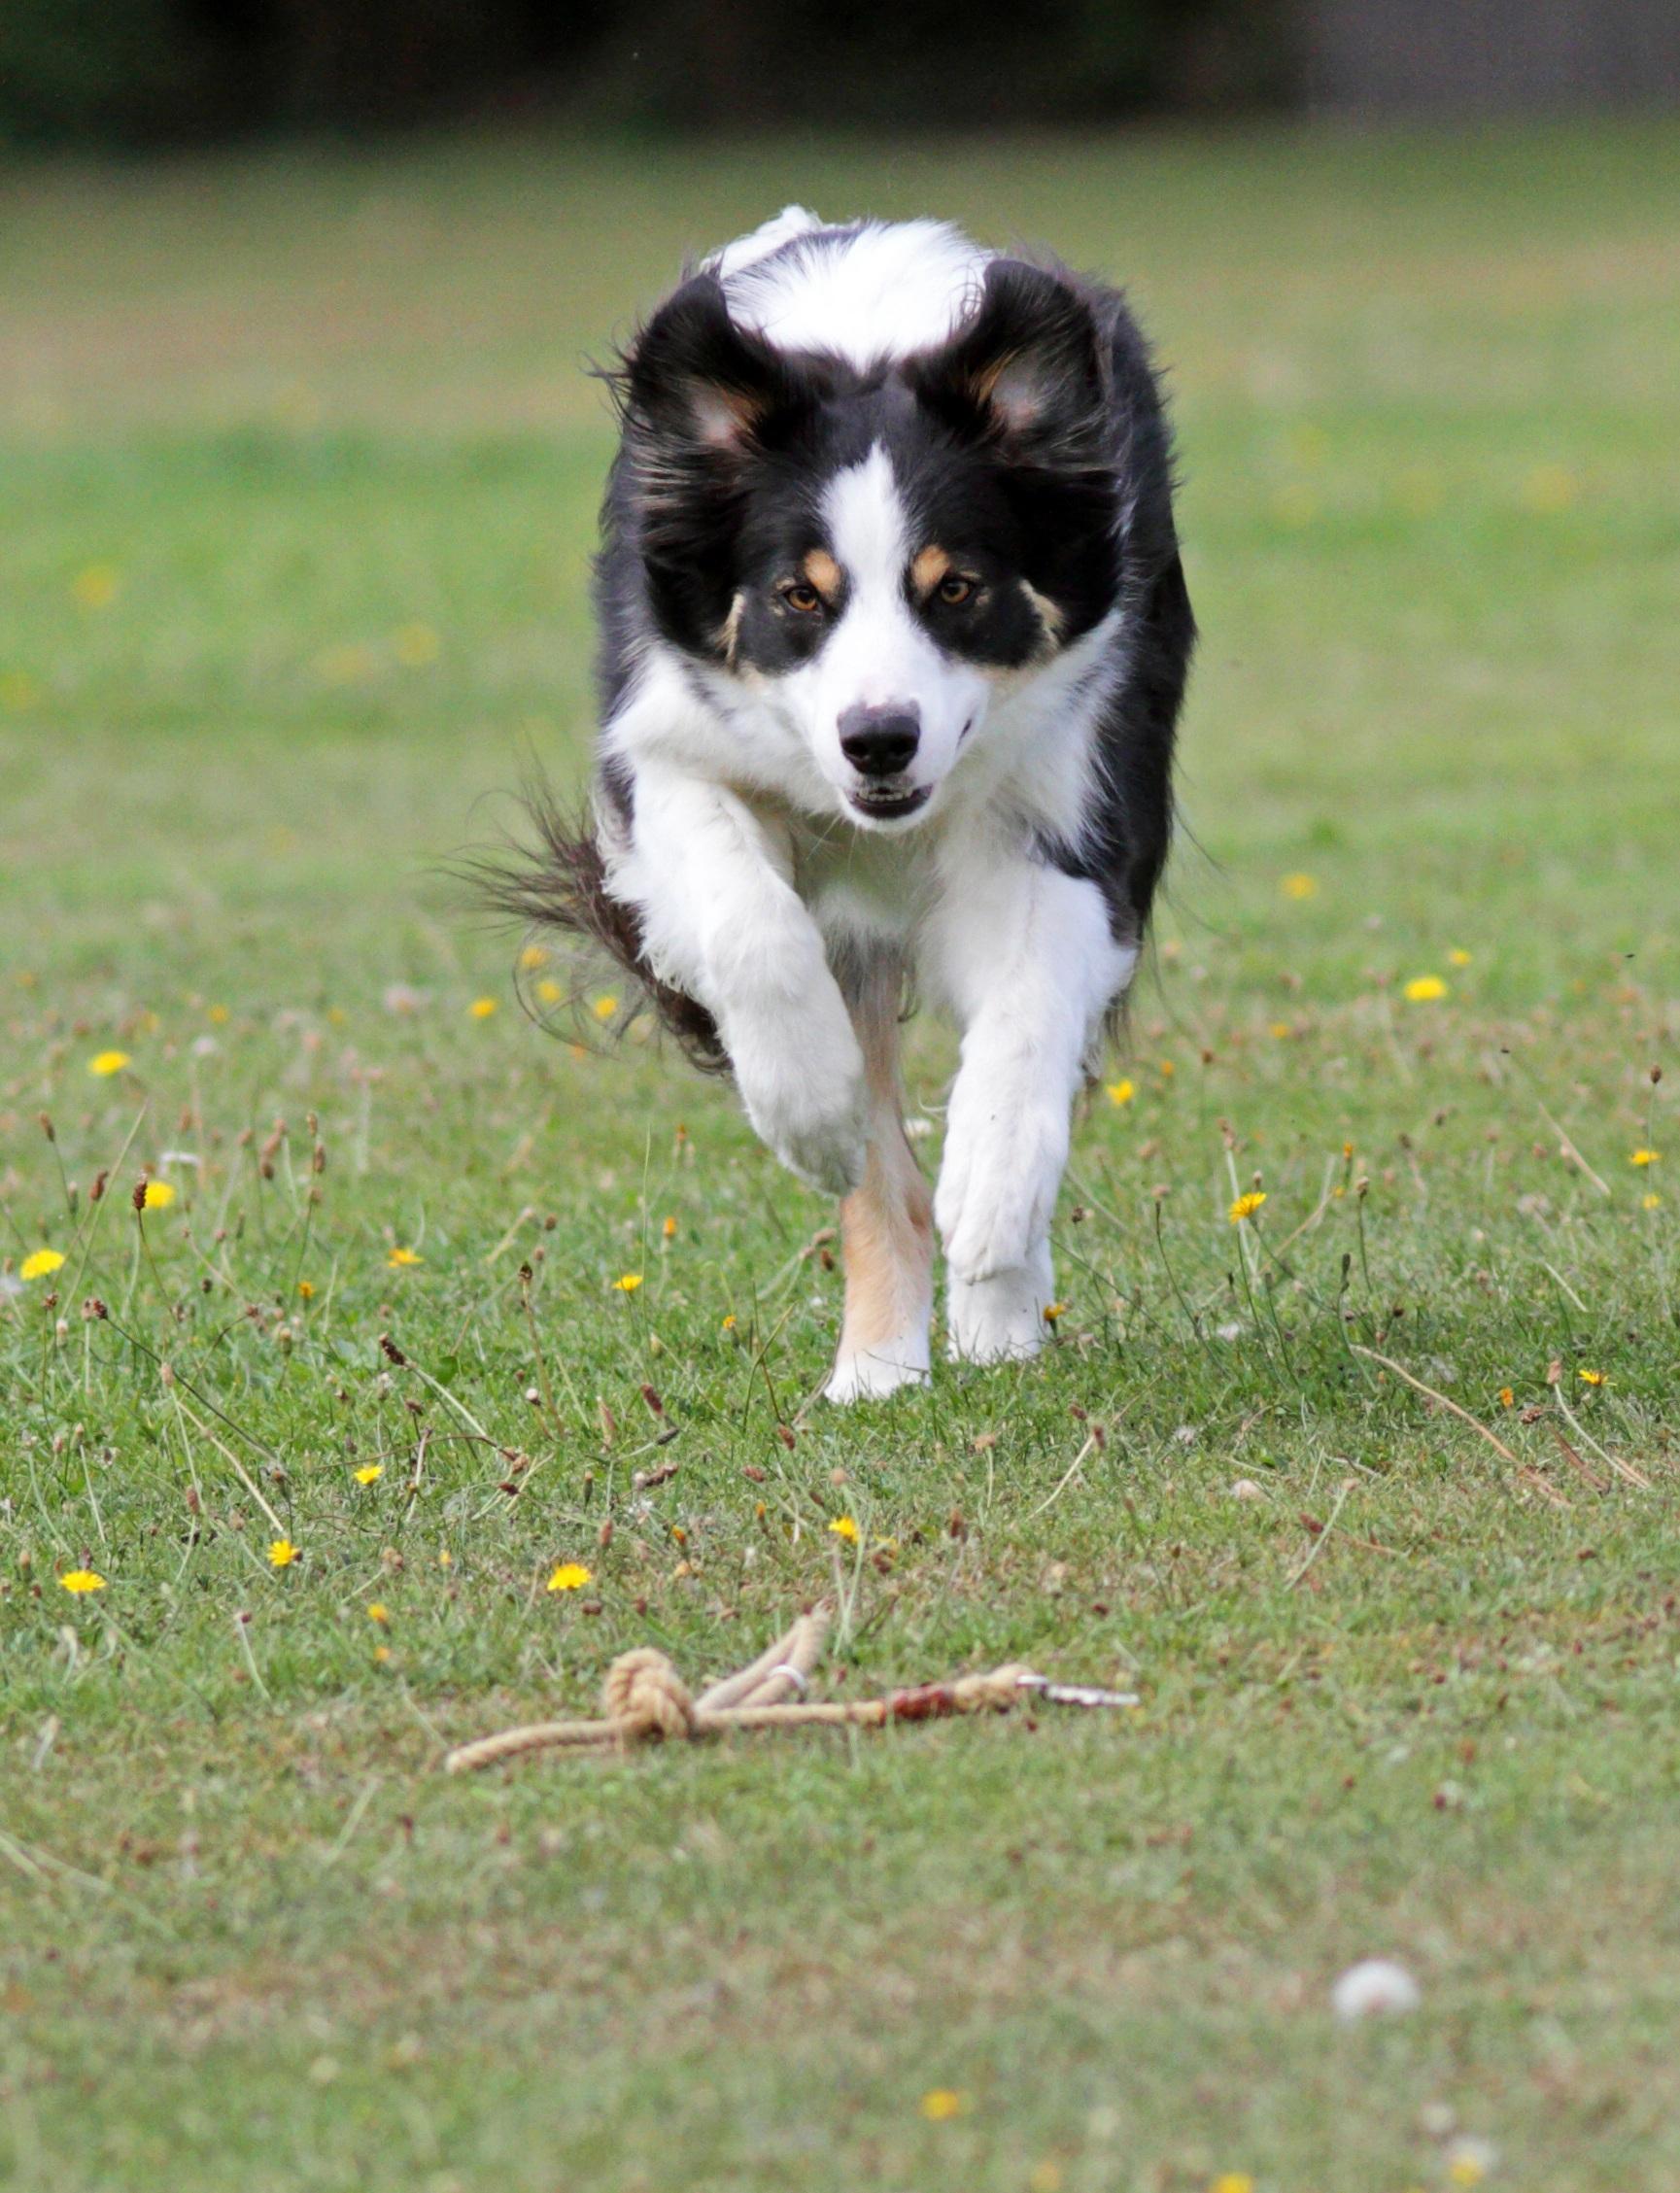 Great Papillon Canine Adorable Dog - nature-white-running-puppy-dog-cute-collie-young-brown-mammal-ear-spaniel-border-collie-face-background-happy-eye-head-vertebrate-papillon-image-fast-adorable-curious-dog-breed-australian-shepherd-dog-like-mammal-carnivoran-dog-breed-group-miniature-australian-shepherd-phalene-641057  2018_797891  .jpg